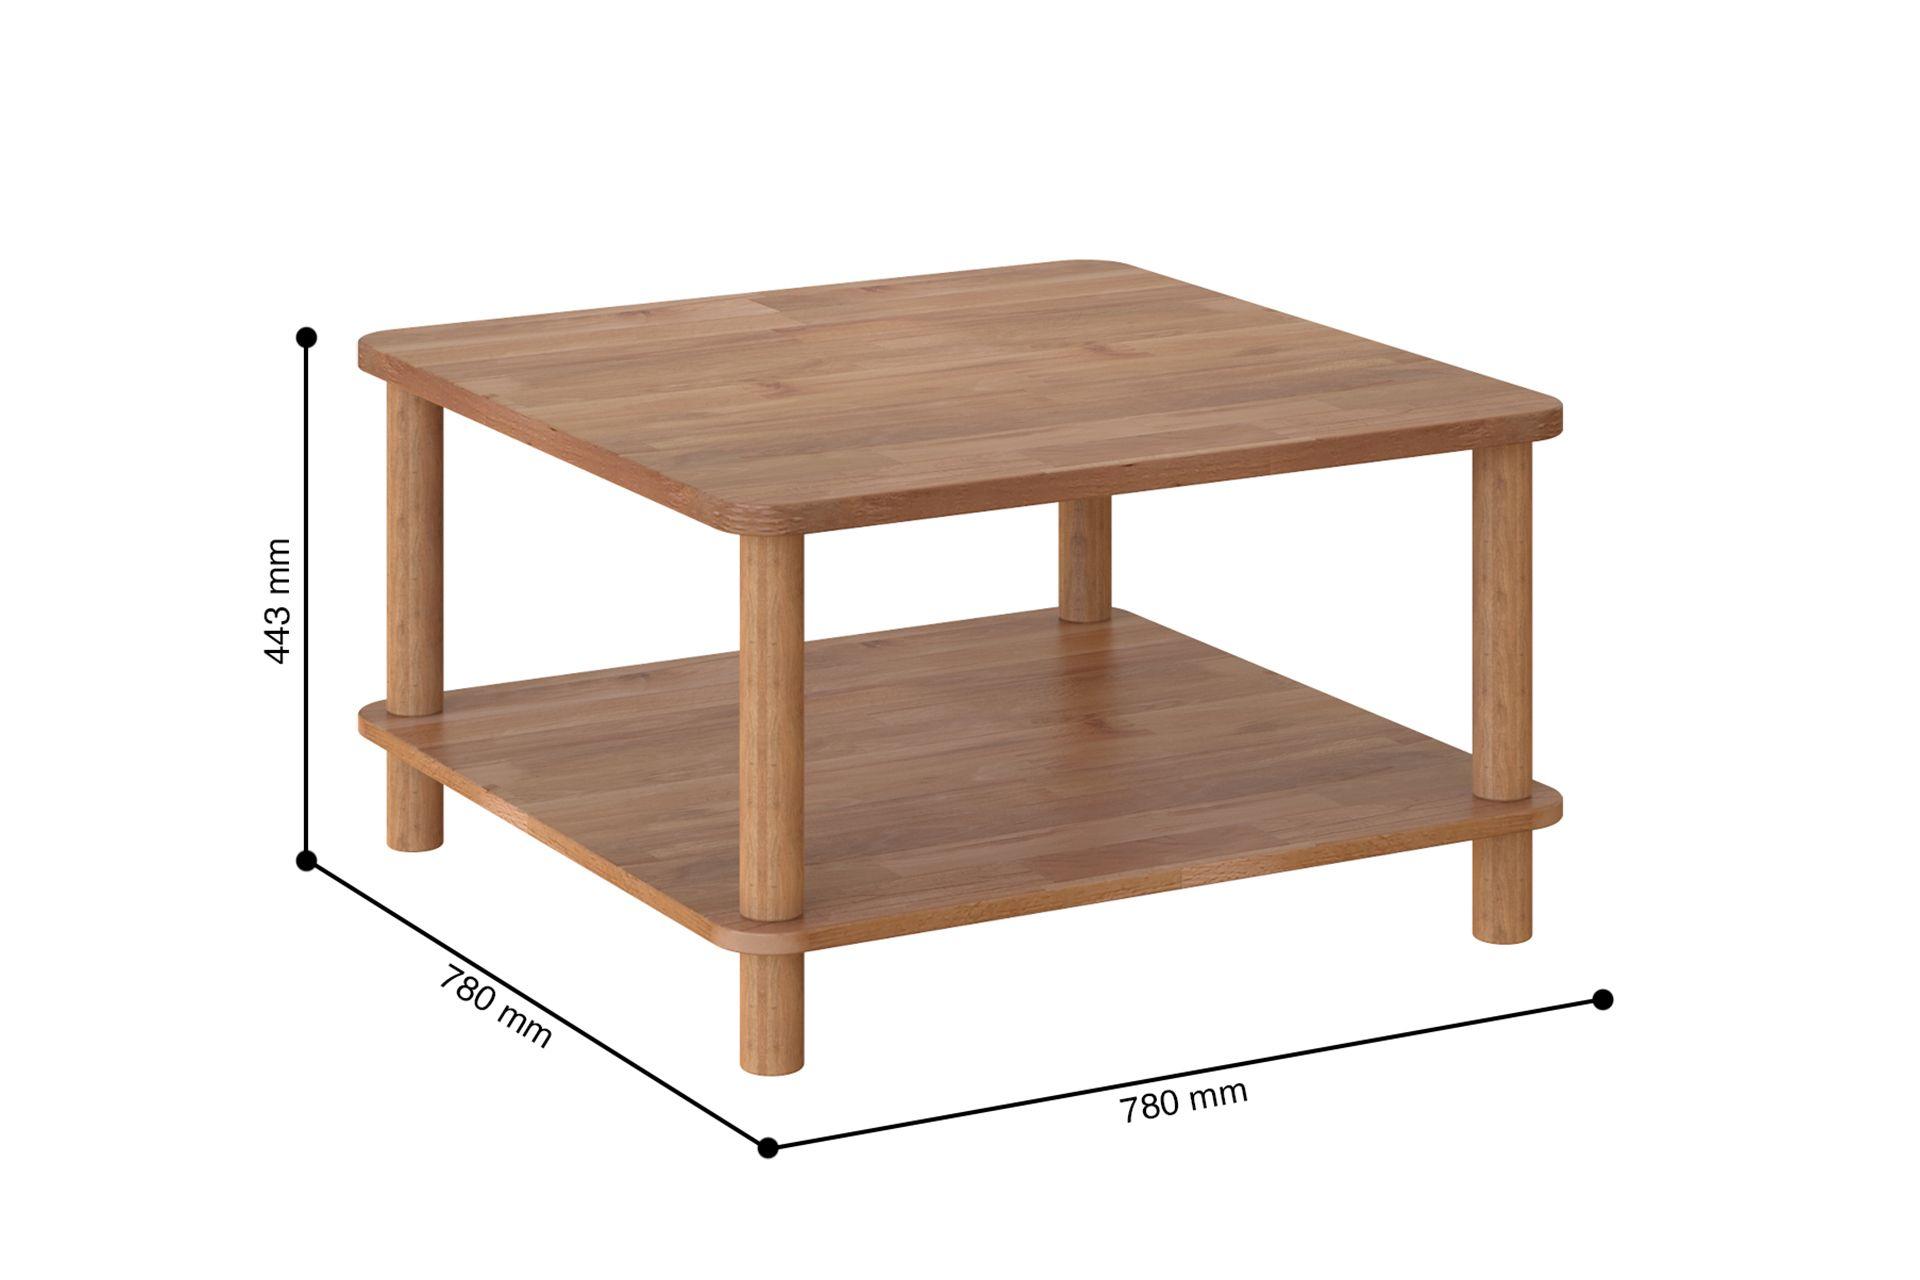 Maya Velne Coffee Table (Large)